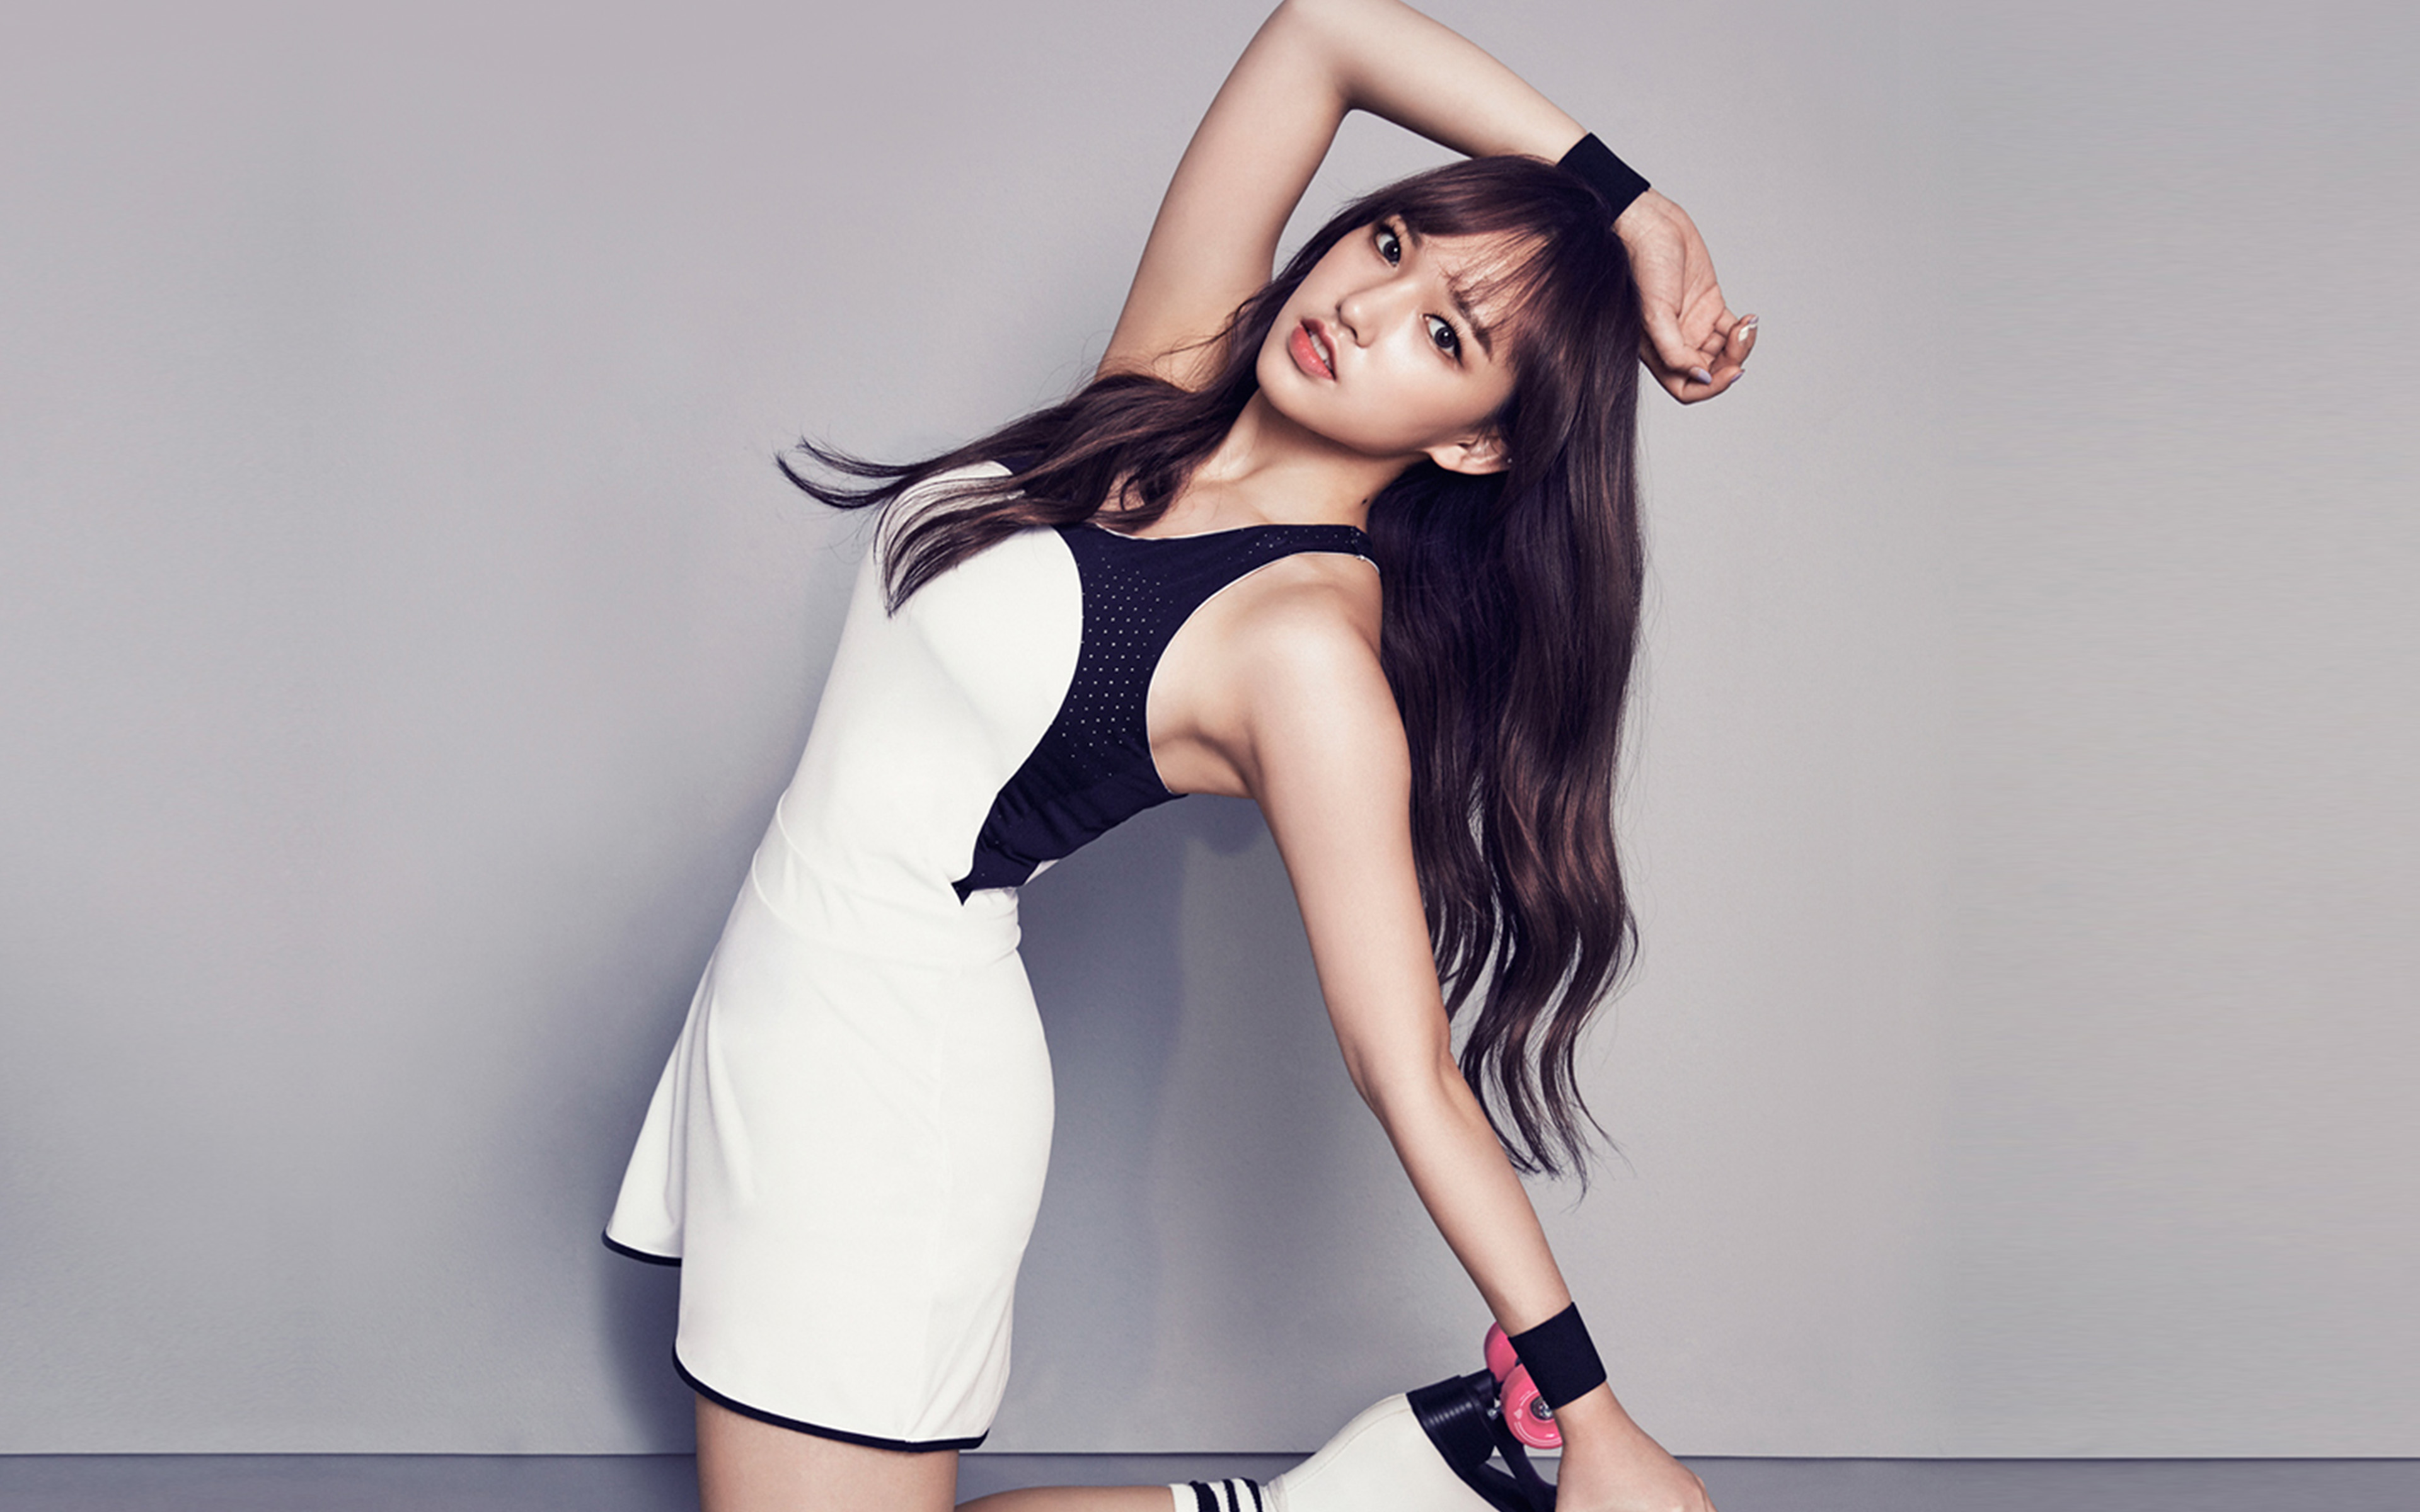 Hk79 Sungso Kpop Girl Cute Wallpaper